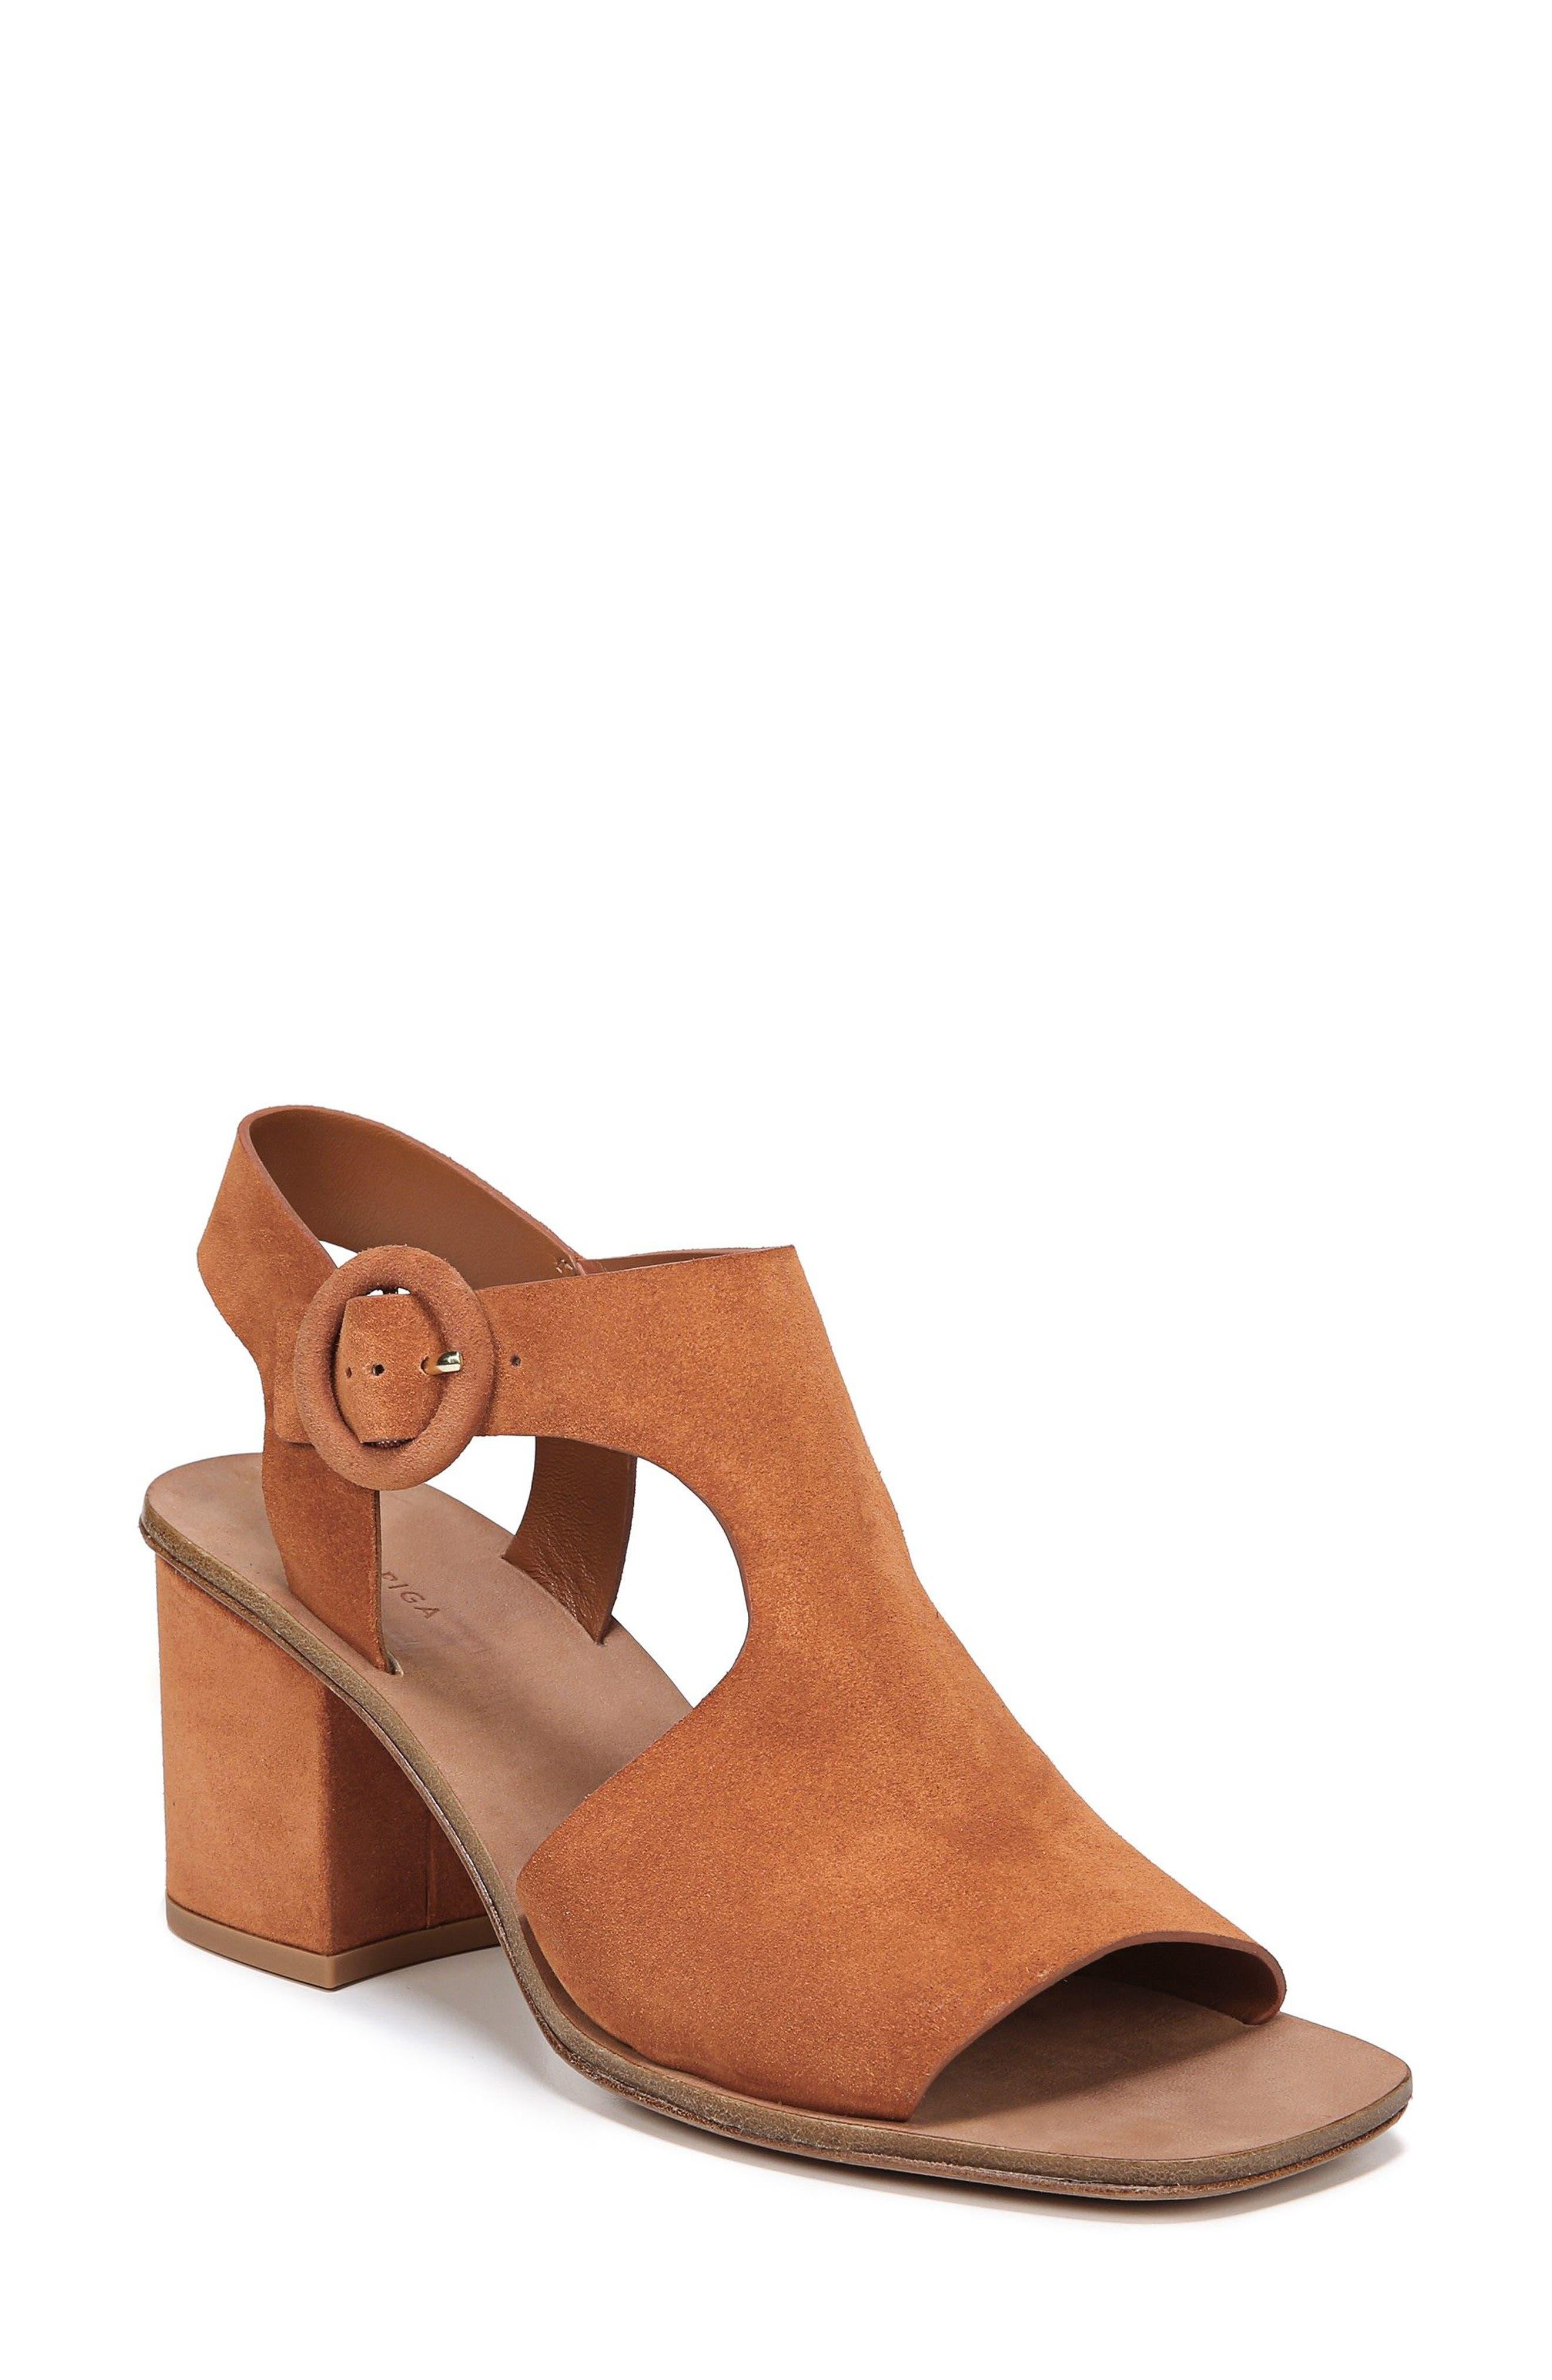 Katya Shield Sandal,                             Main thumbnail 2, color,